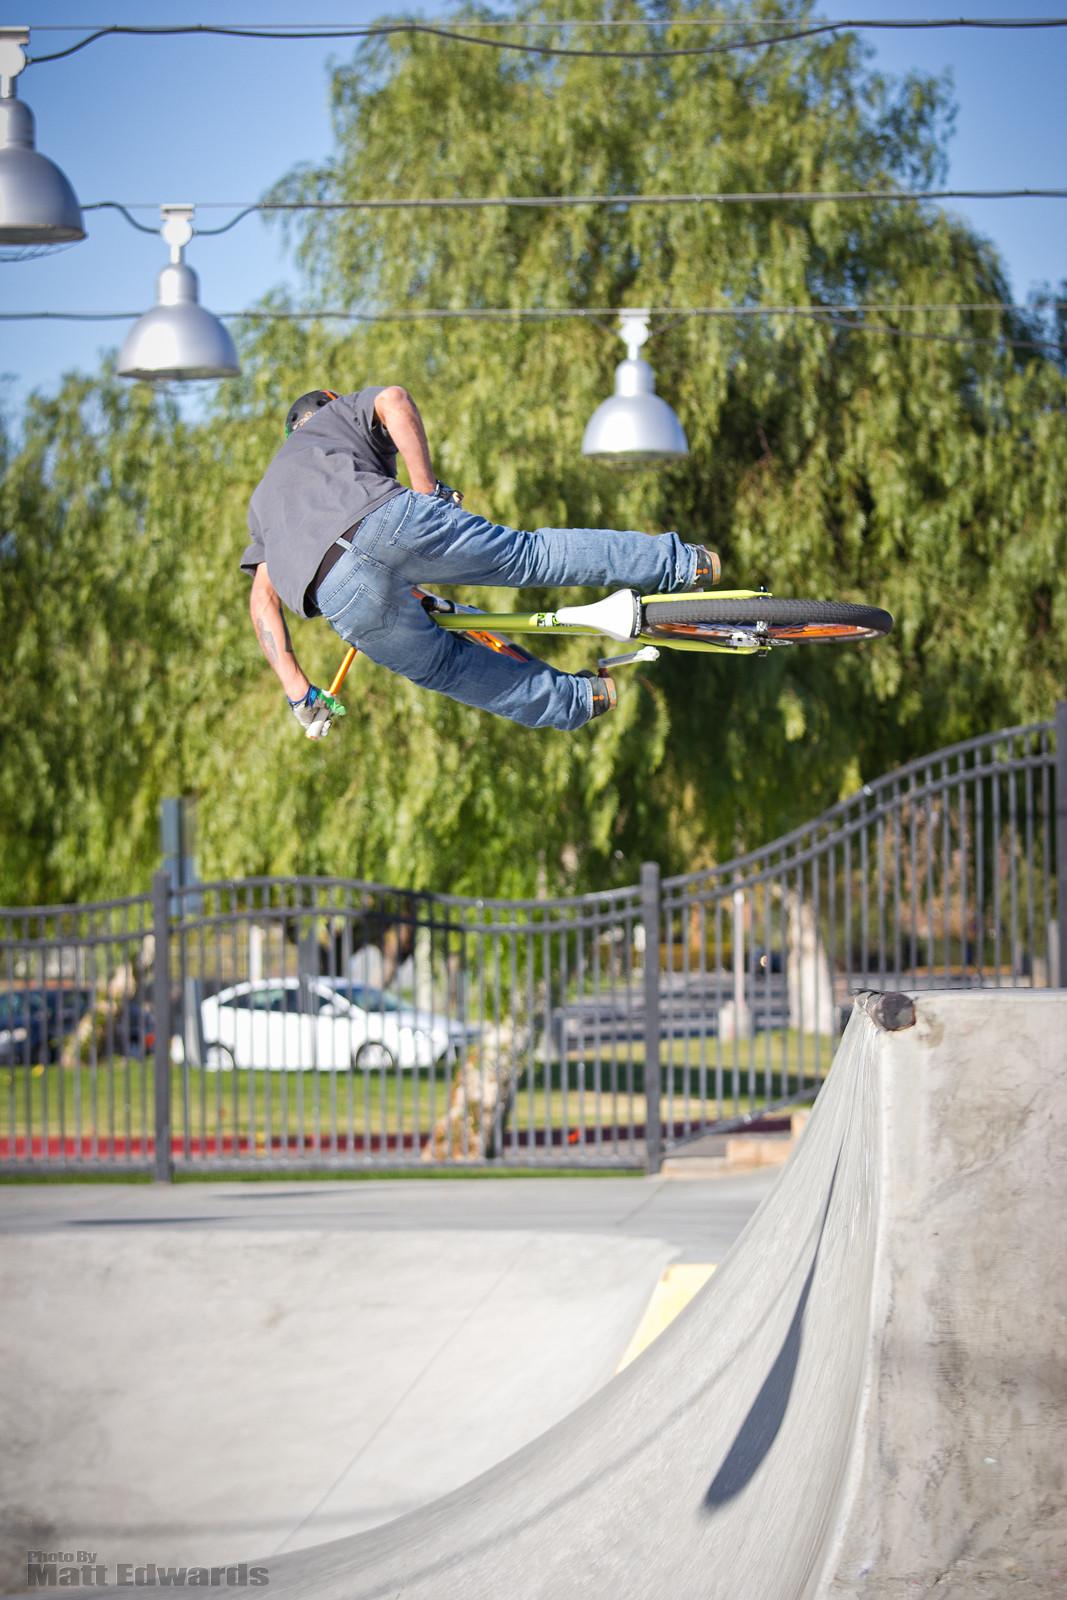 Palm Springs Skate Park - EdwardsEntertainment - Mountain Biking Pictures - Vital MTB